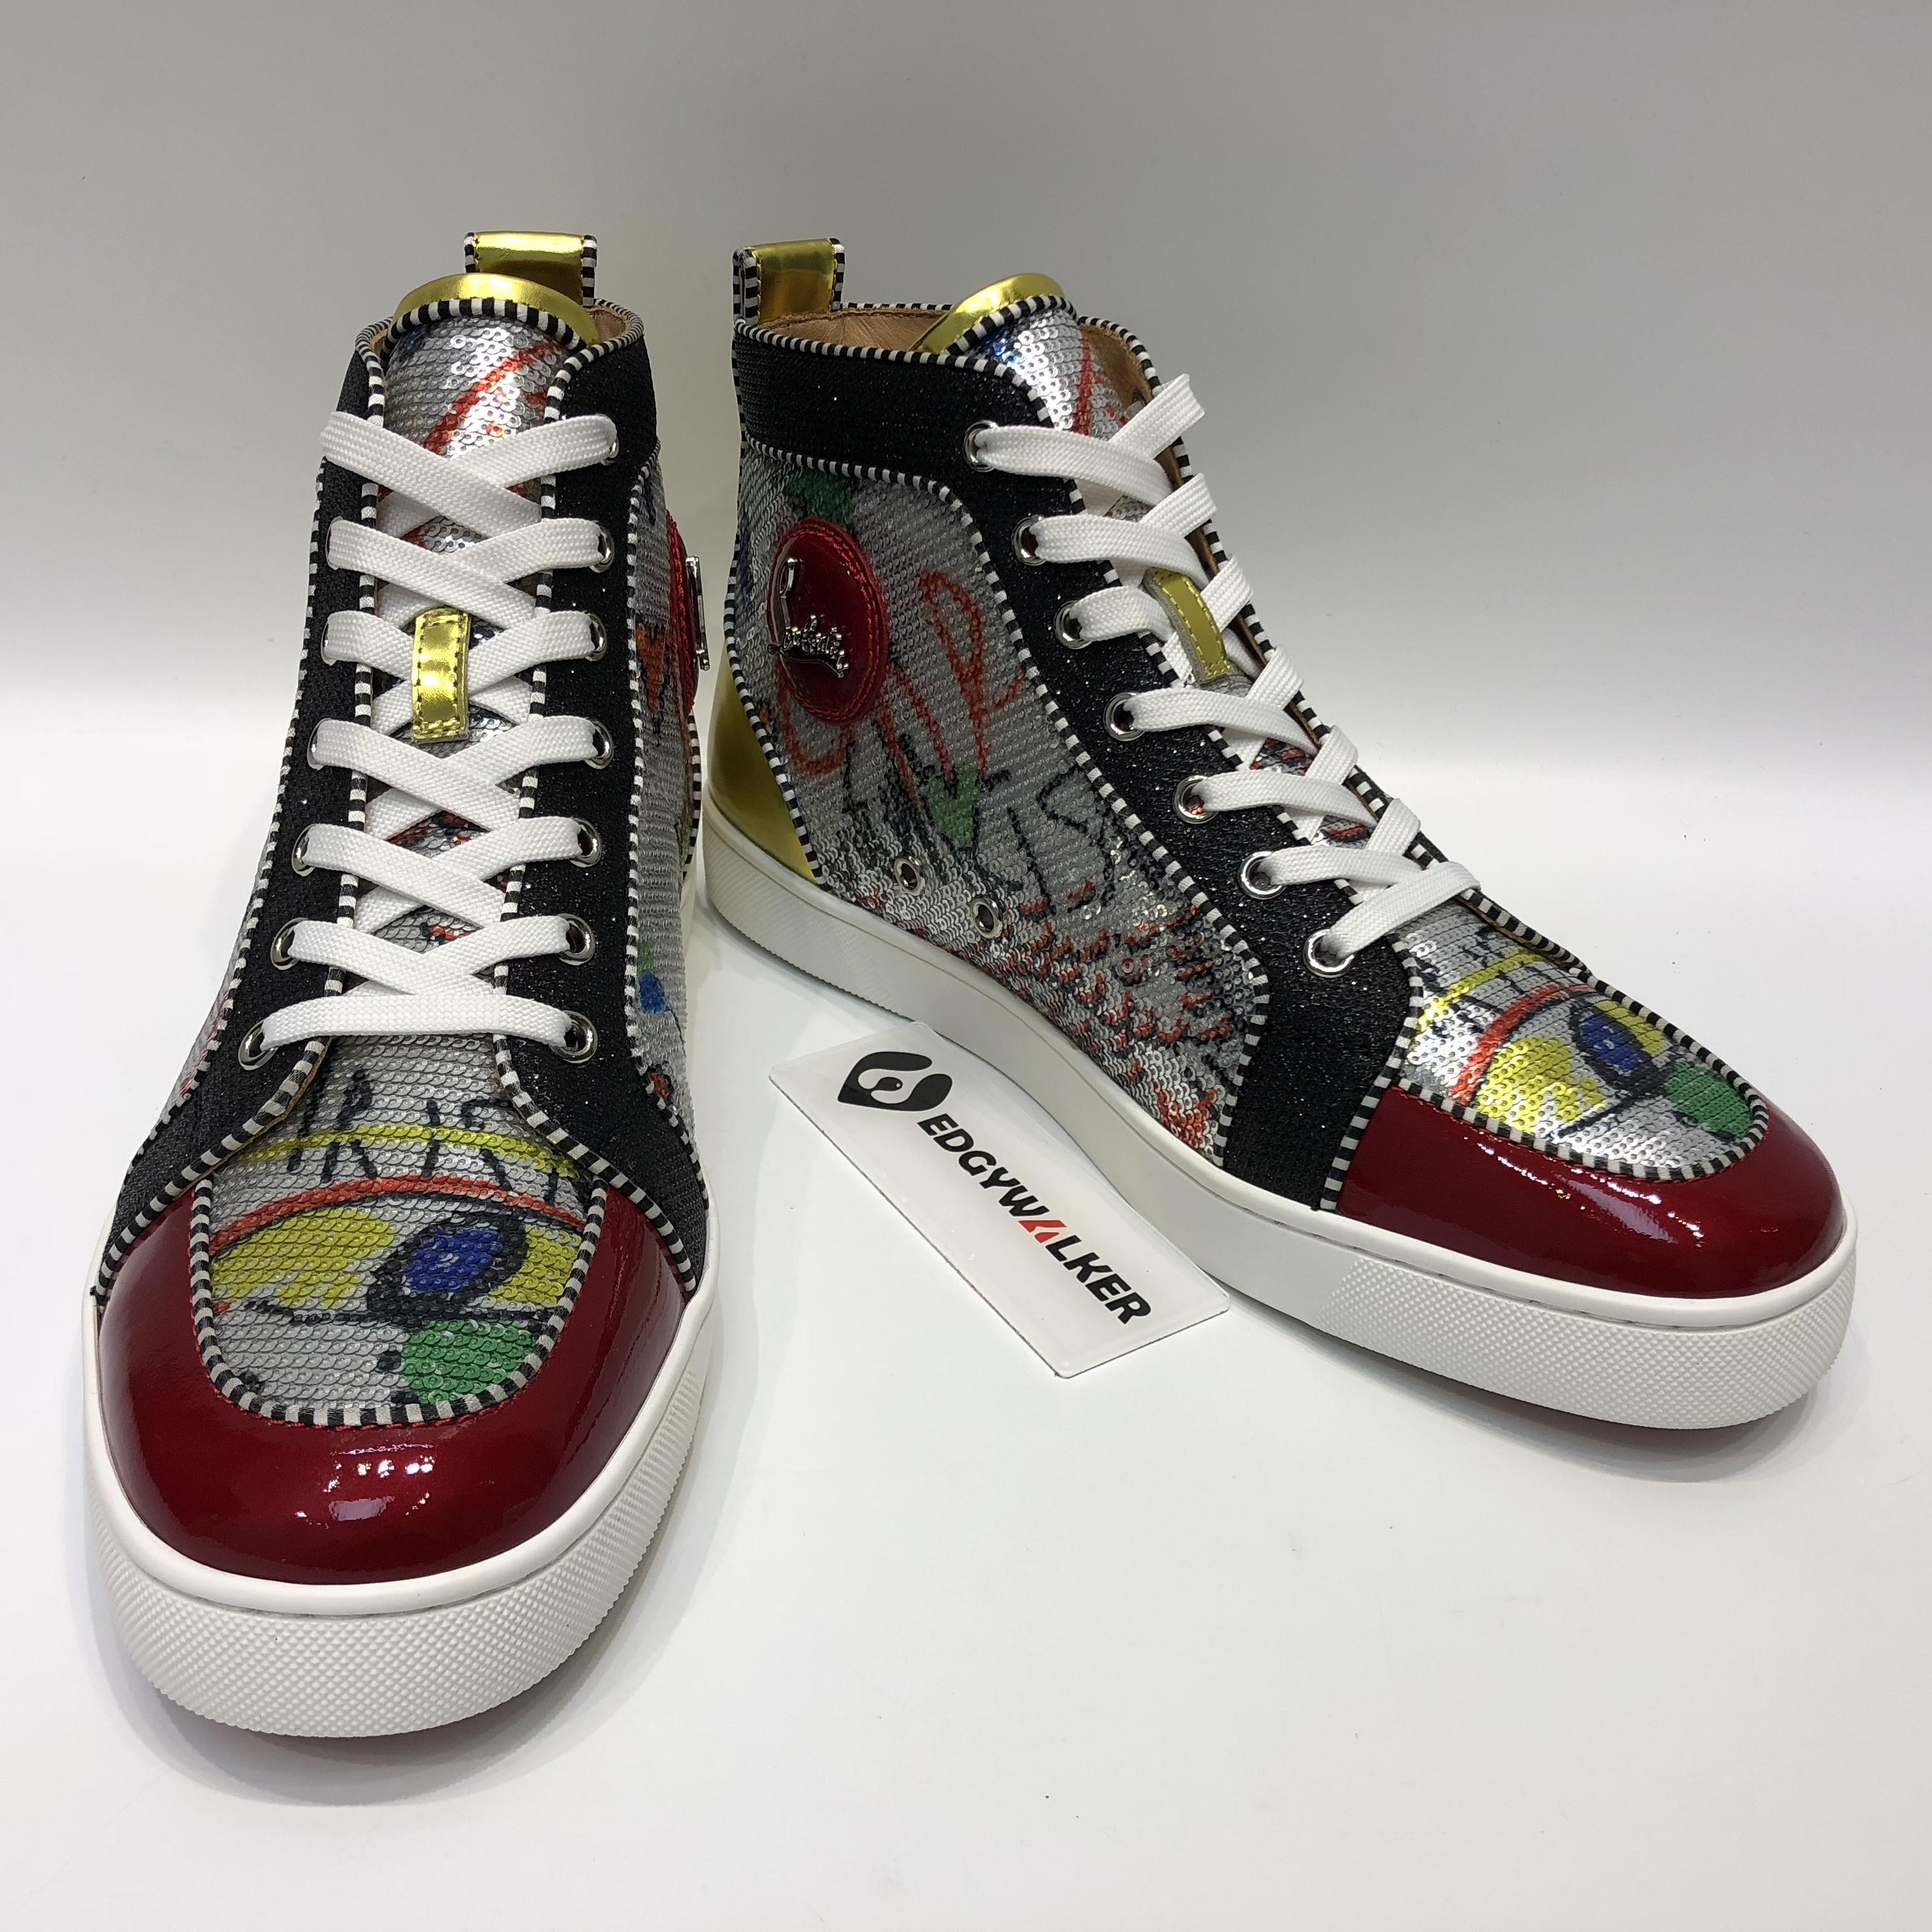 c18c0e0ff38 CLSKH130 Louboutin Rantus Orlato Men s Flat Loubitag Paillette Silver High-Top  Sneaker Item NO  CLSKH130